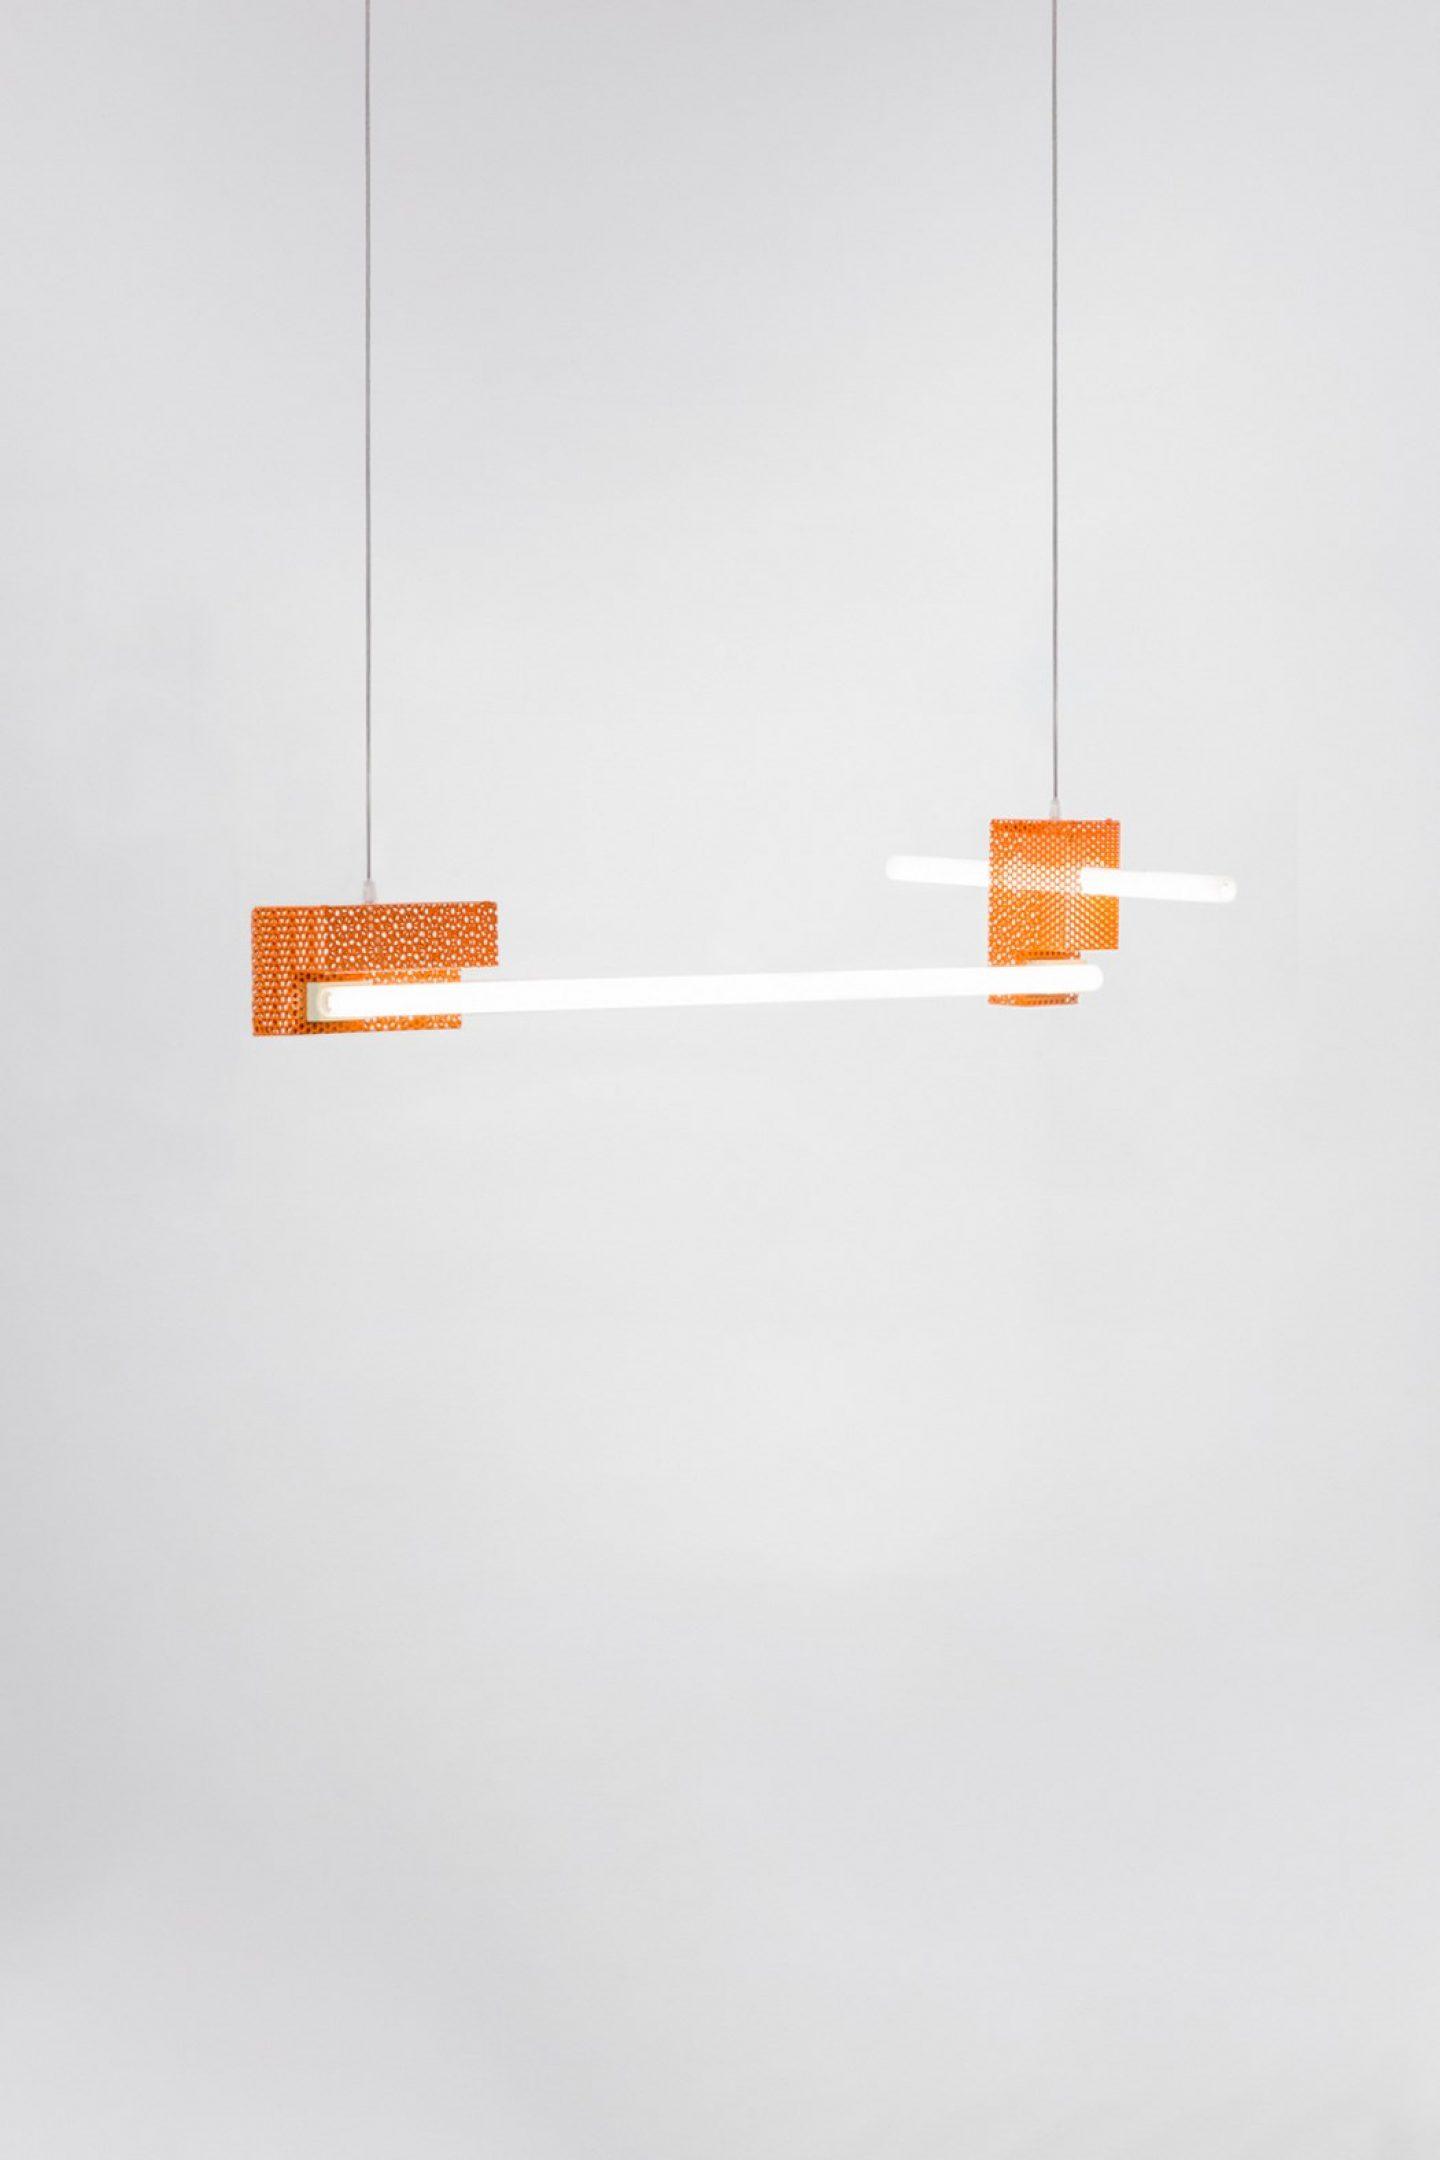 Marta_Ayla_Design (9)